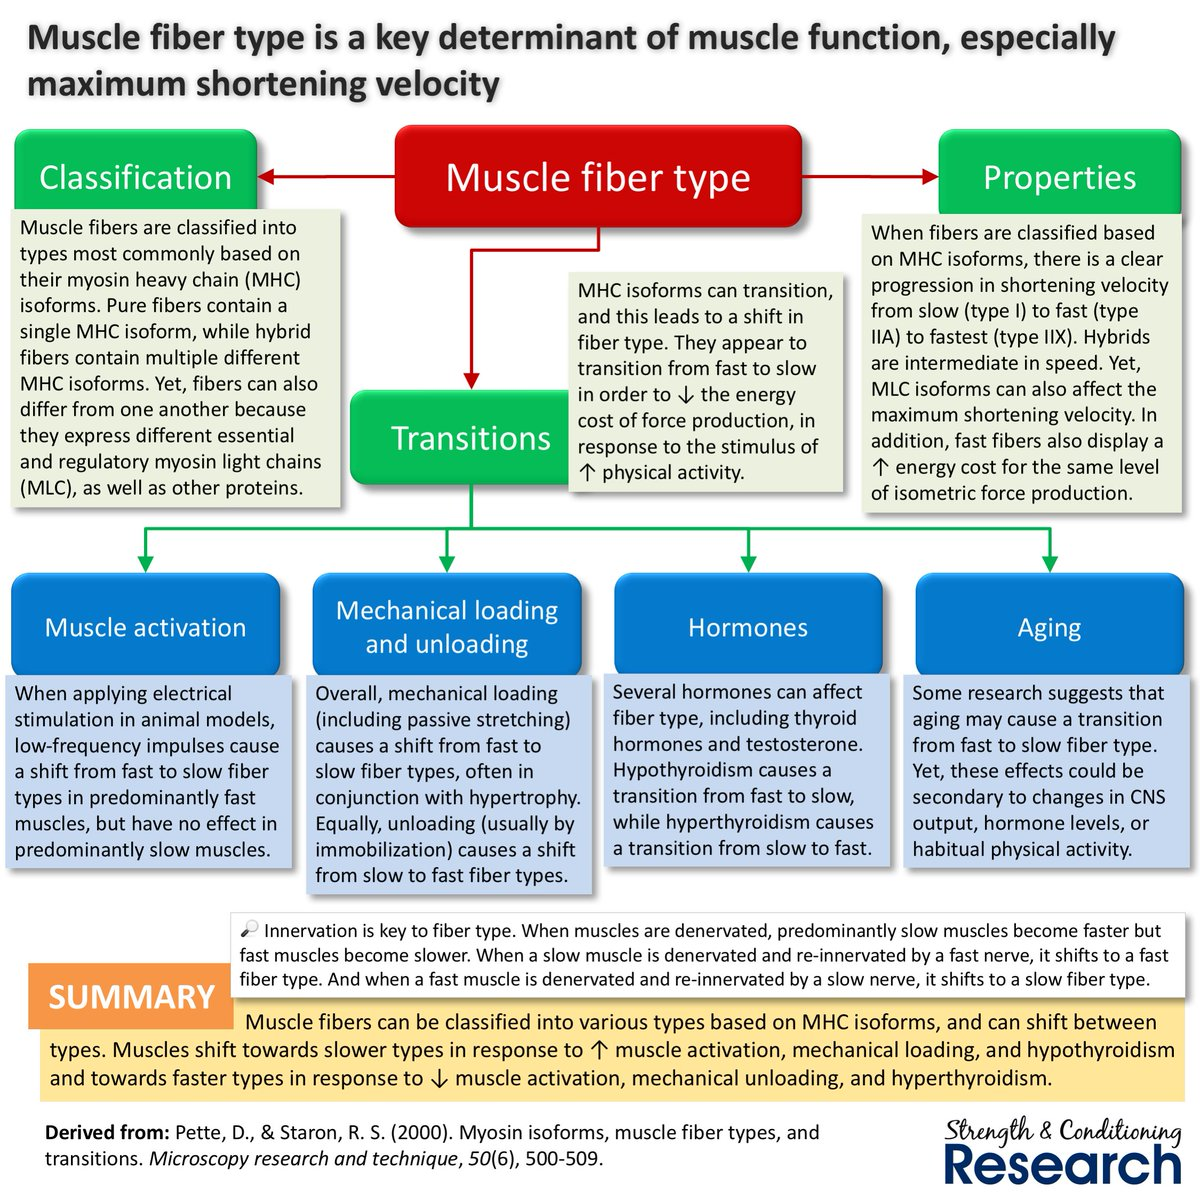 MICROSCOPY RESEARCH AND TECHNIQUE PDF